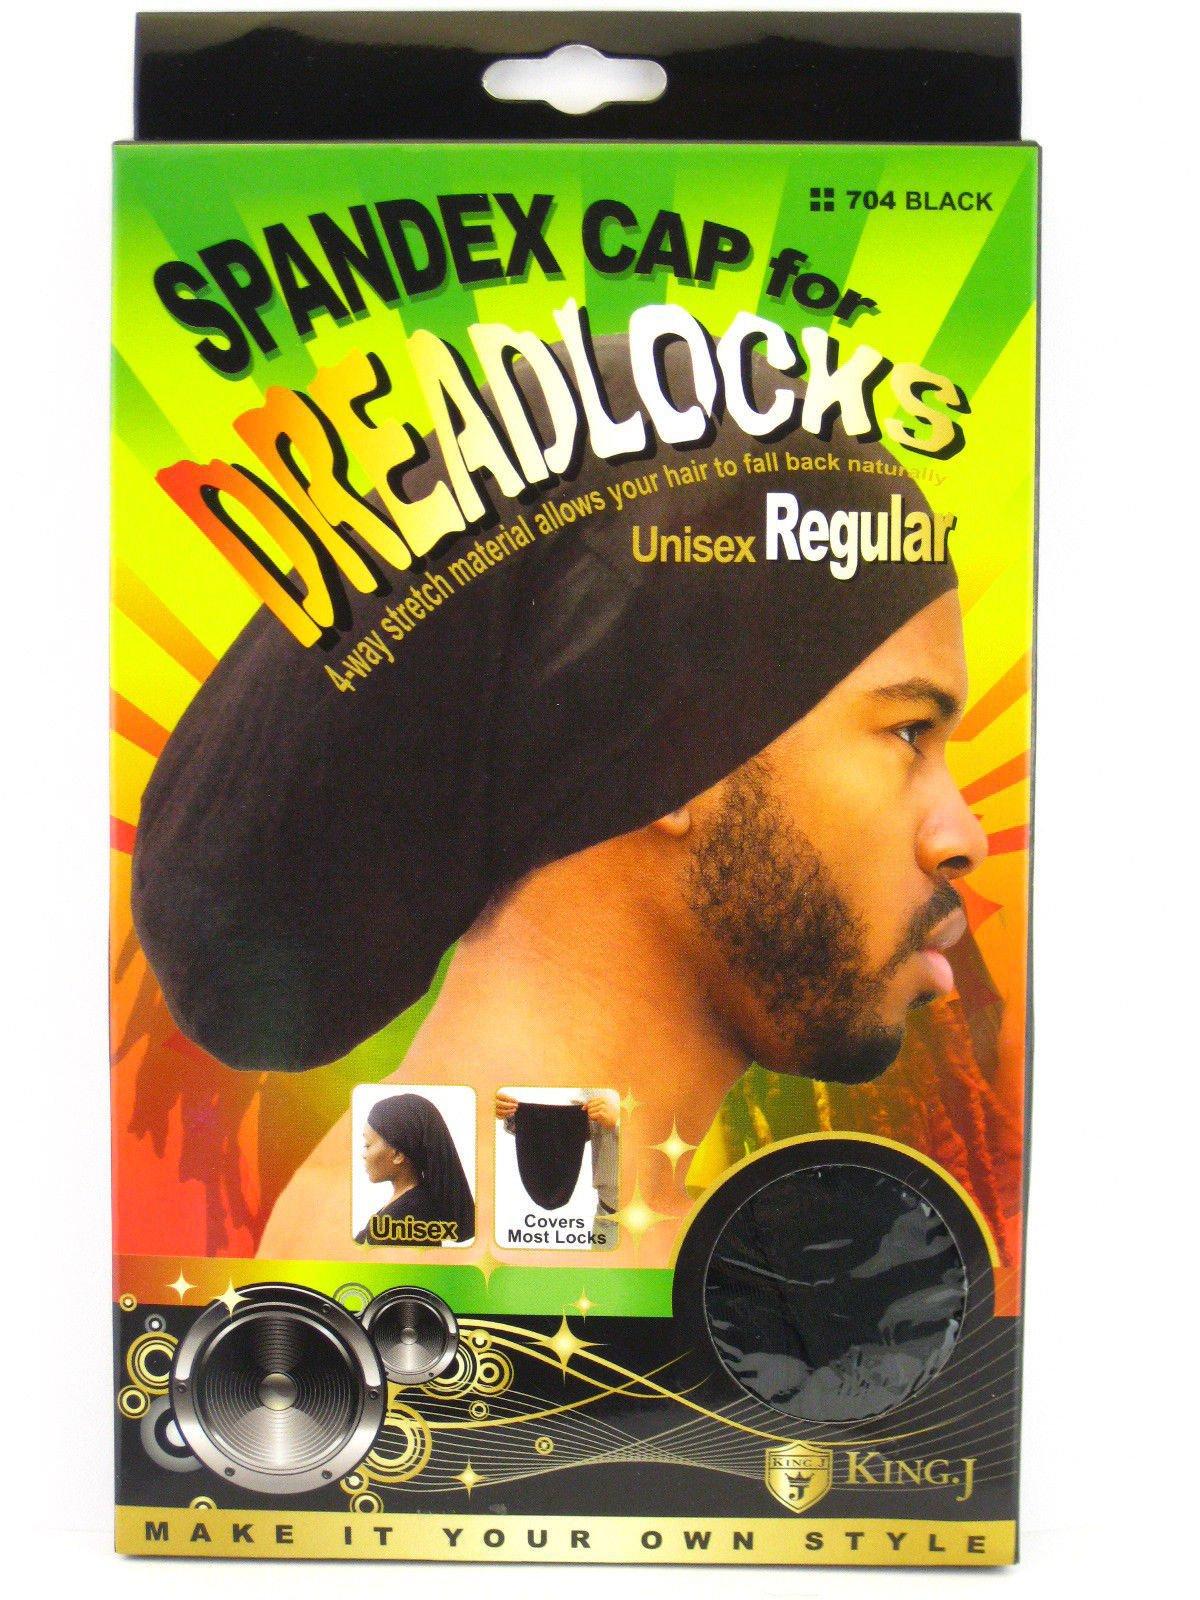 (PACK OF 6) King J DREADLOCKS WAVE CAP (BLACK)